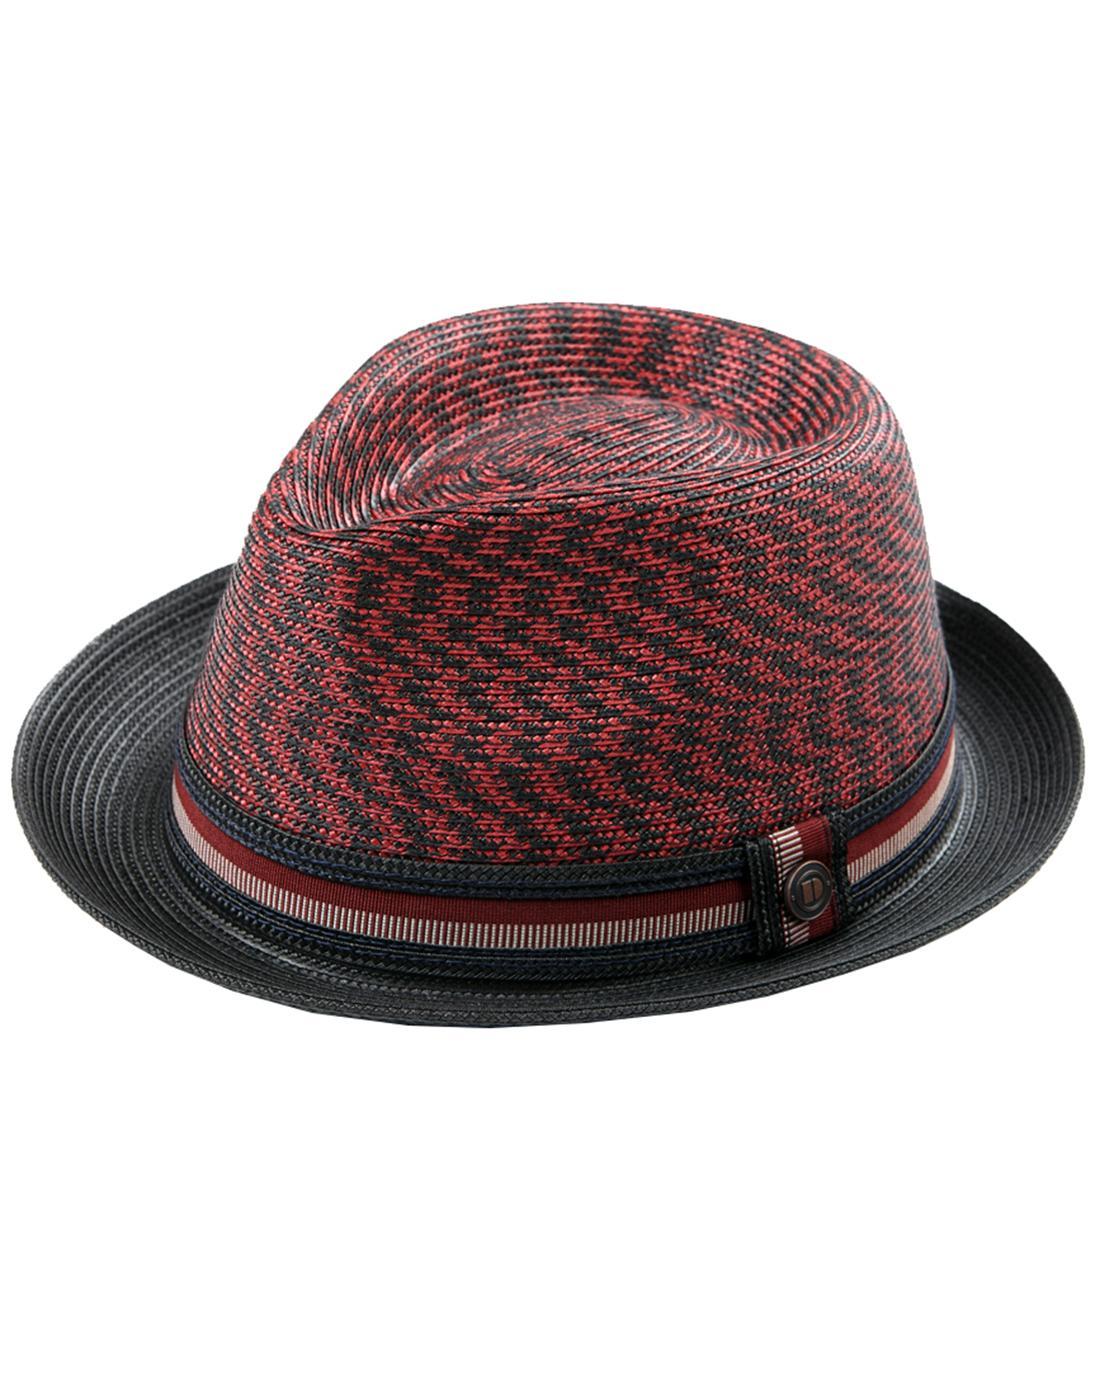 Adrian DASMARCA Retro Mod Volcano Weave Trilby Hat